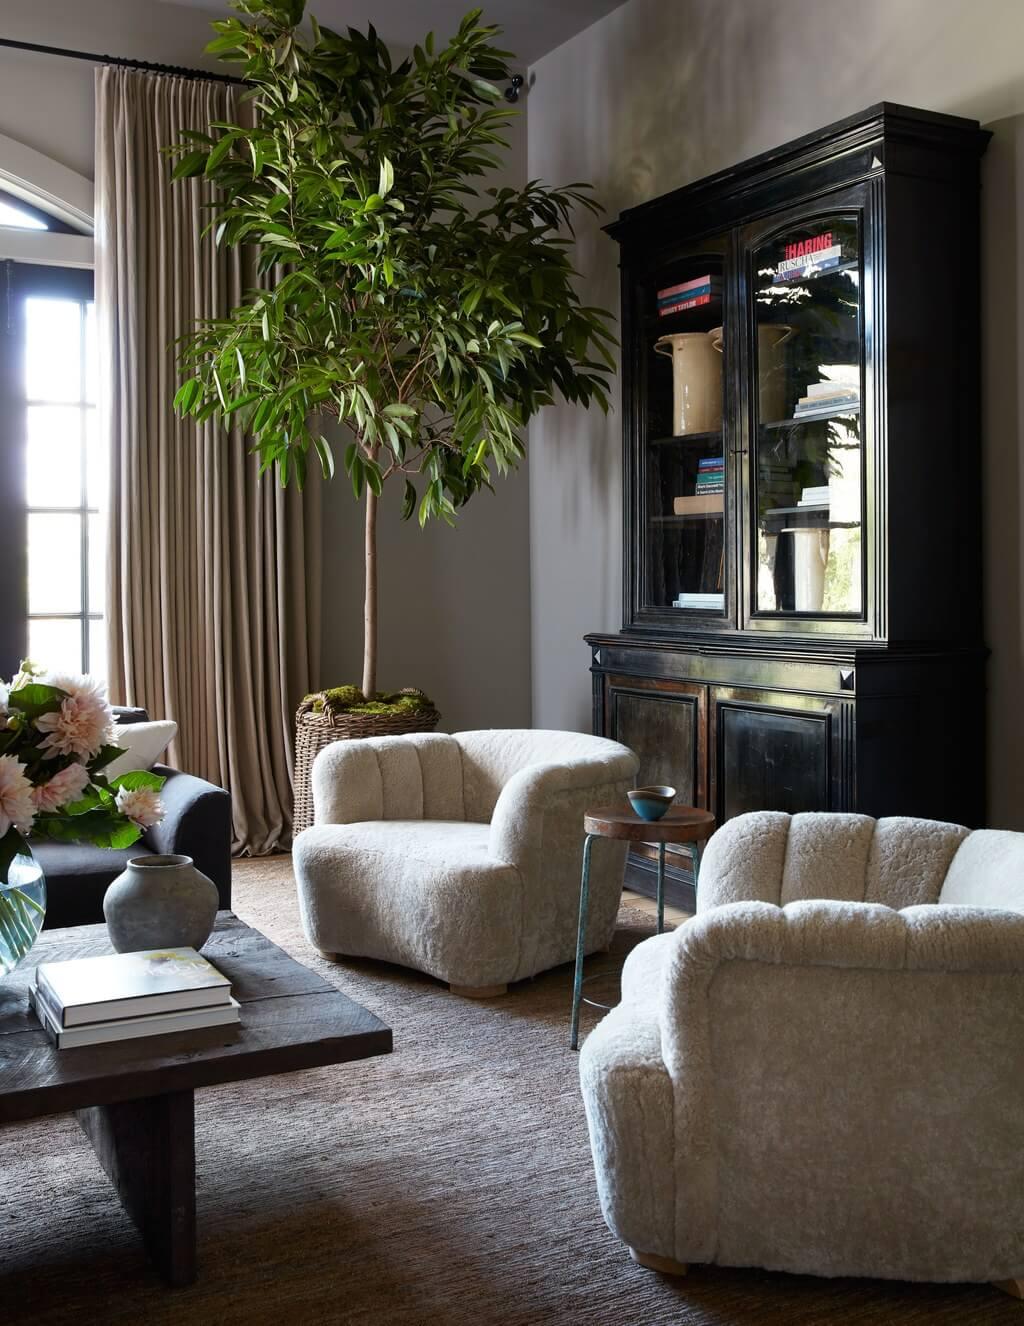 The Stunning Californian Home of Jessica Alba